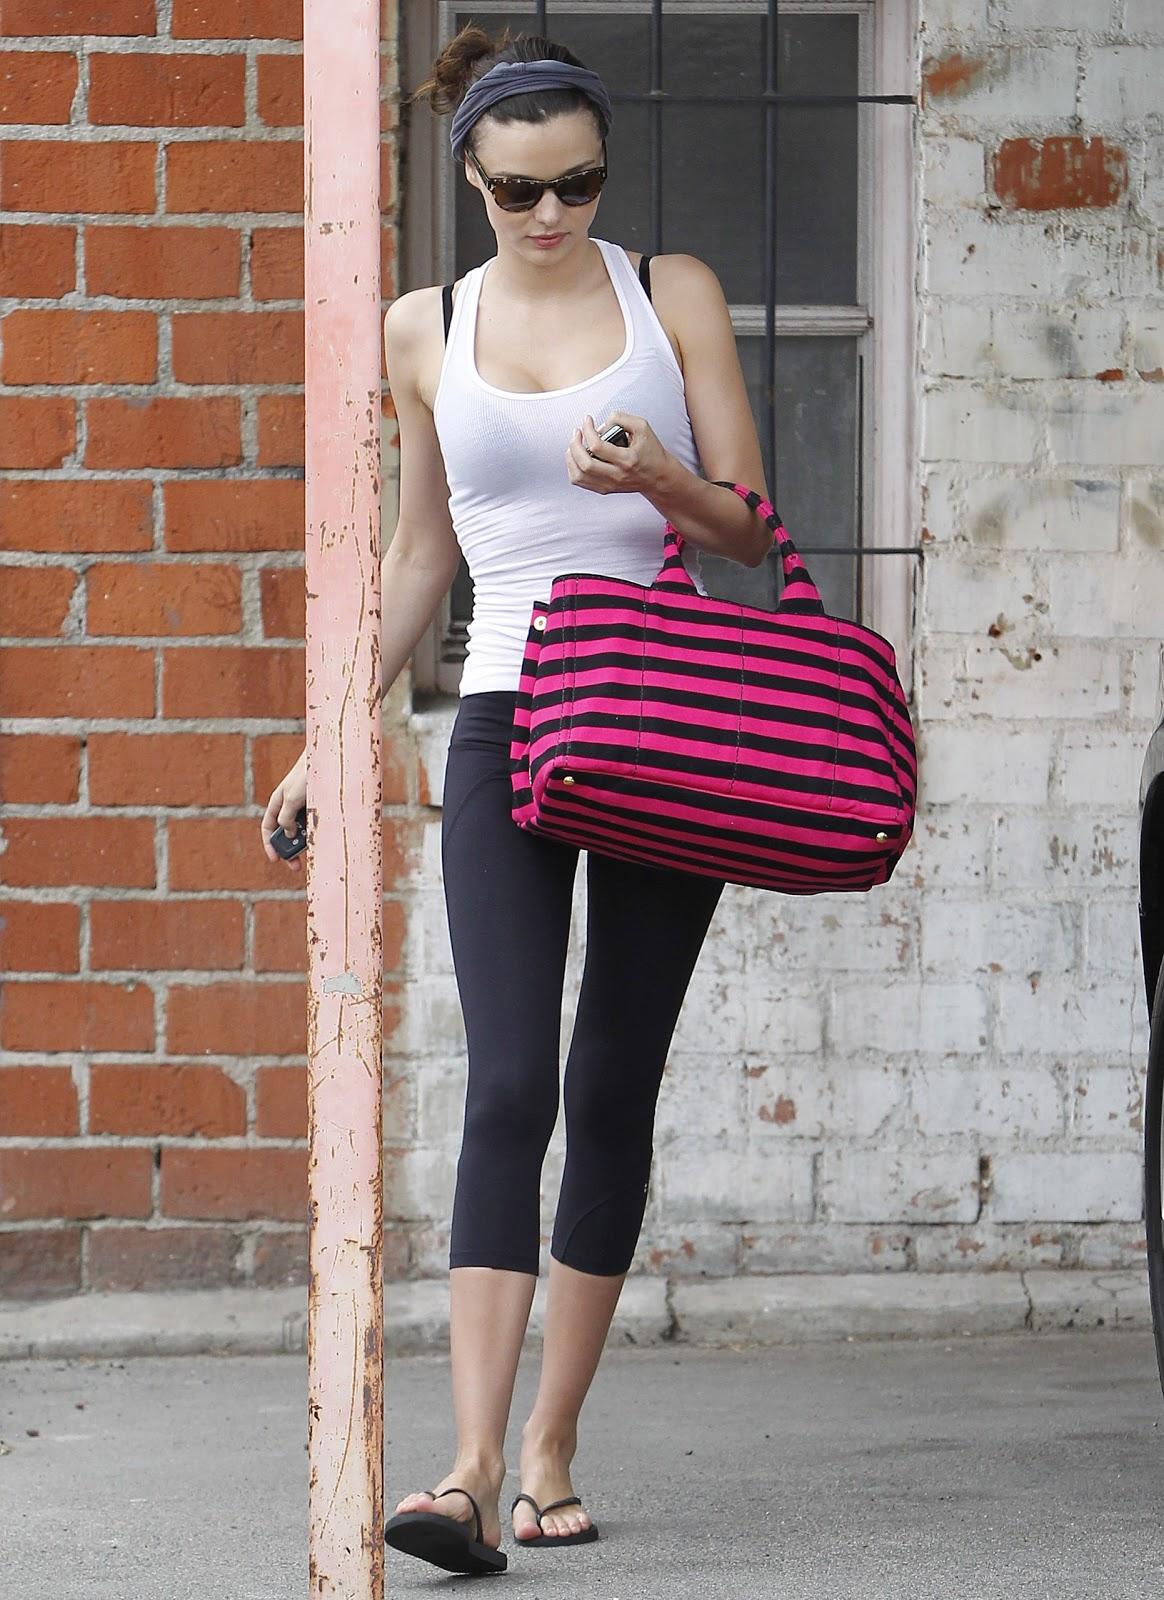 Miranda Kerr weight loss June 2011 - Models Inspiration